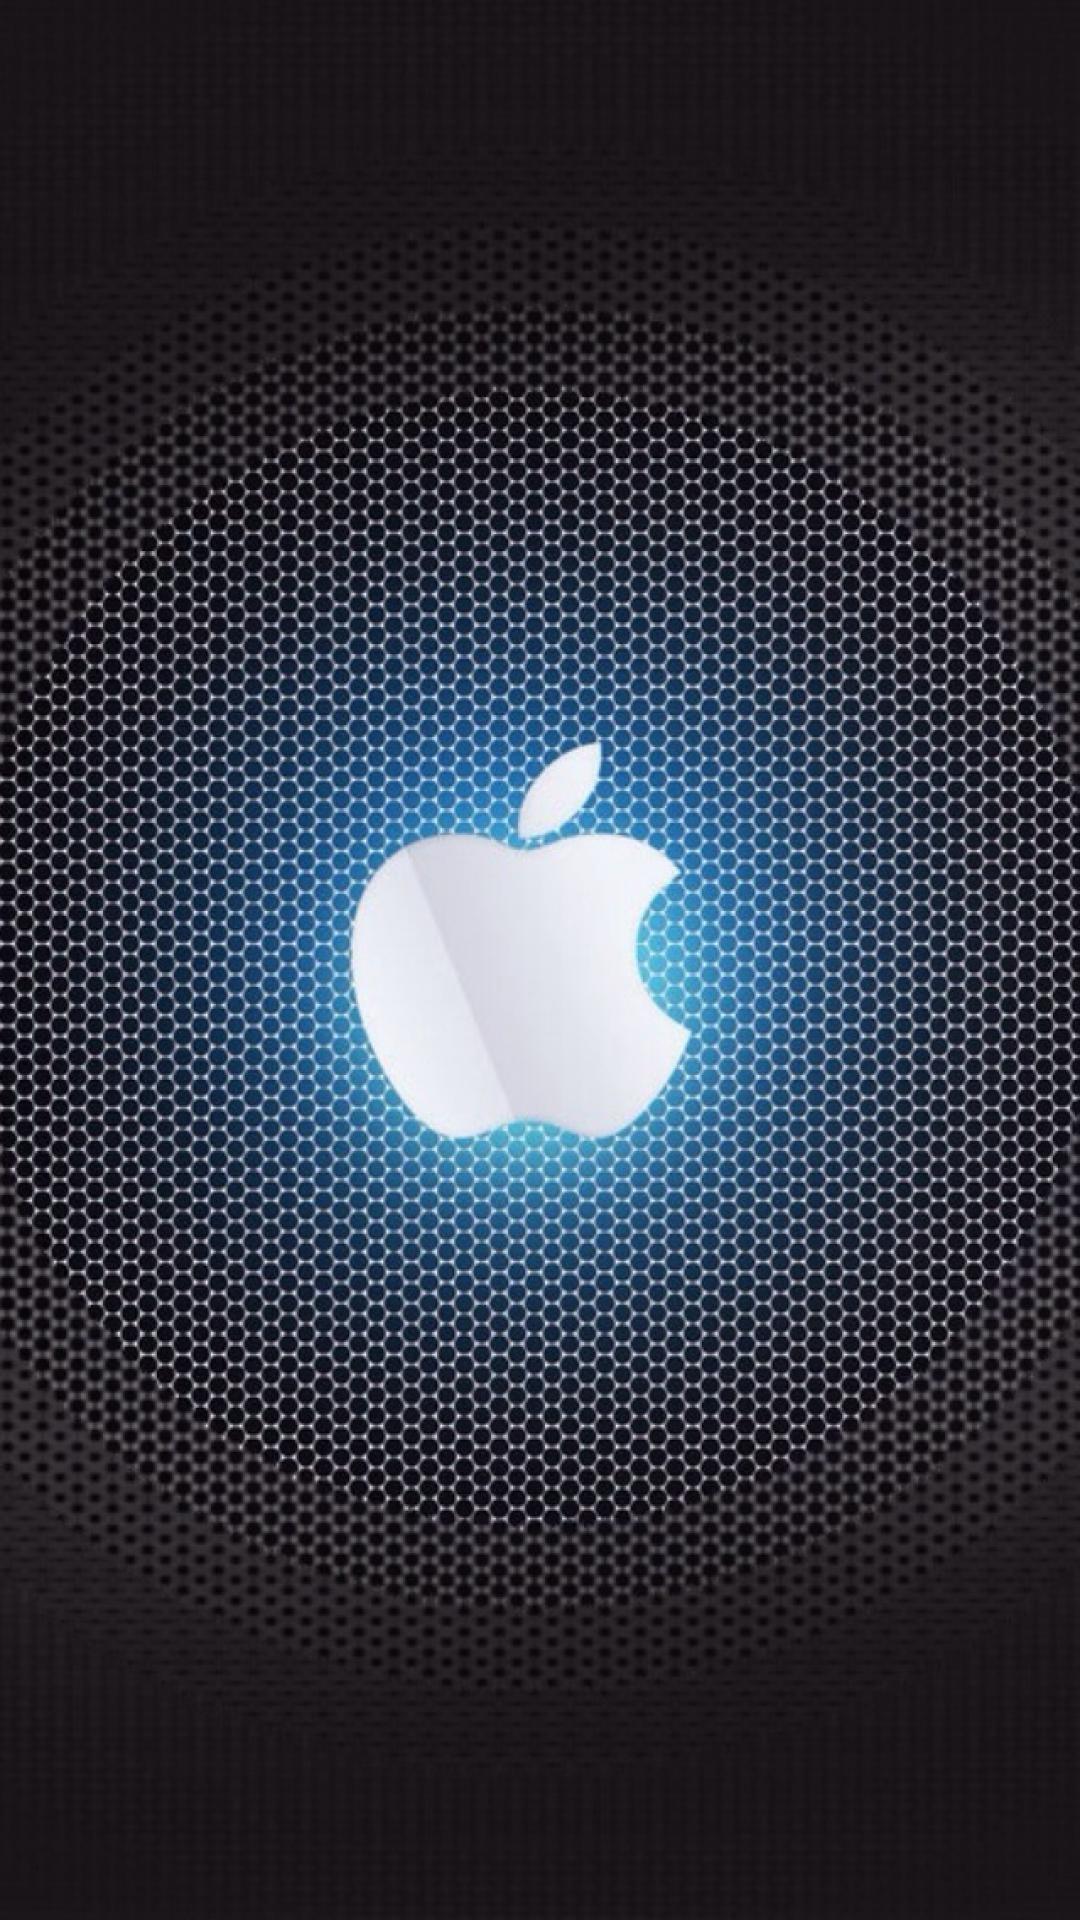 Apple Logo 4k Wallpapers Wallpaper Cave